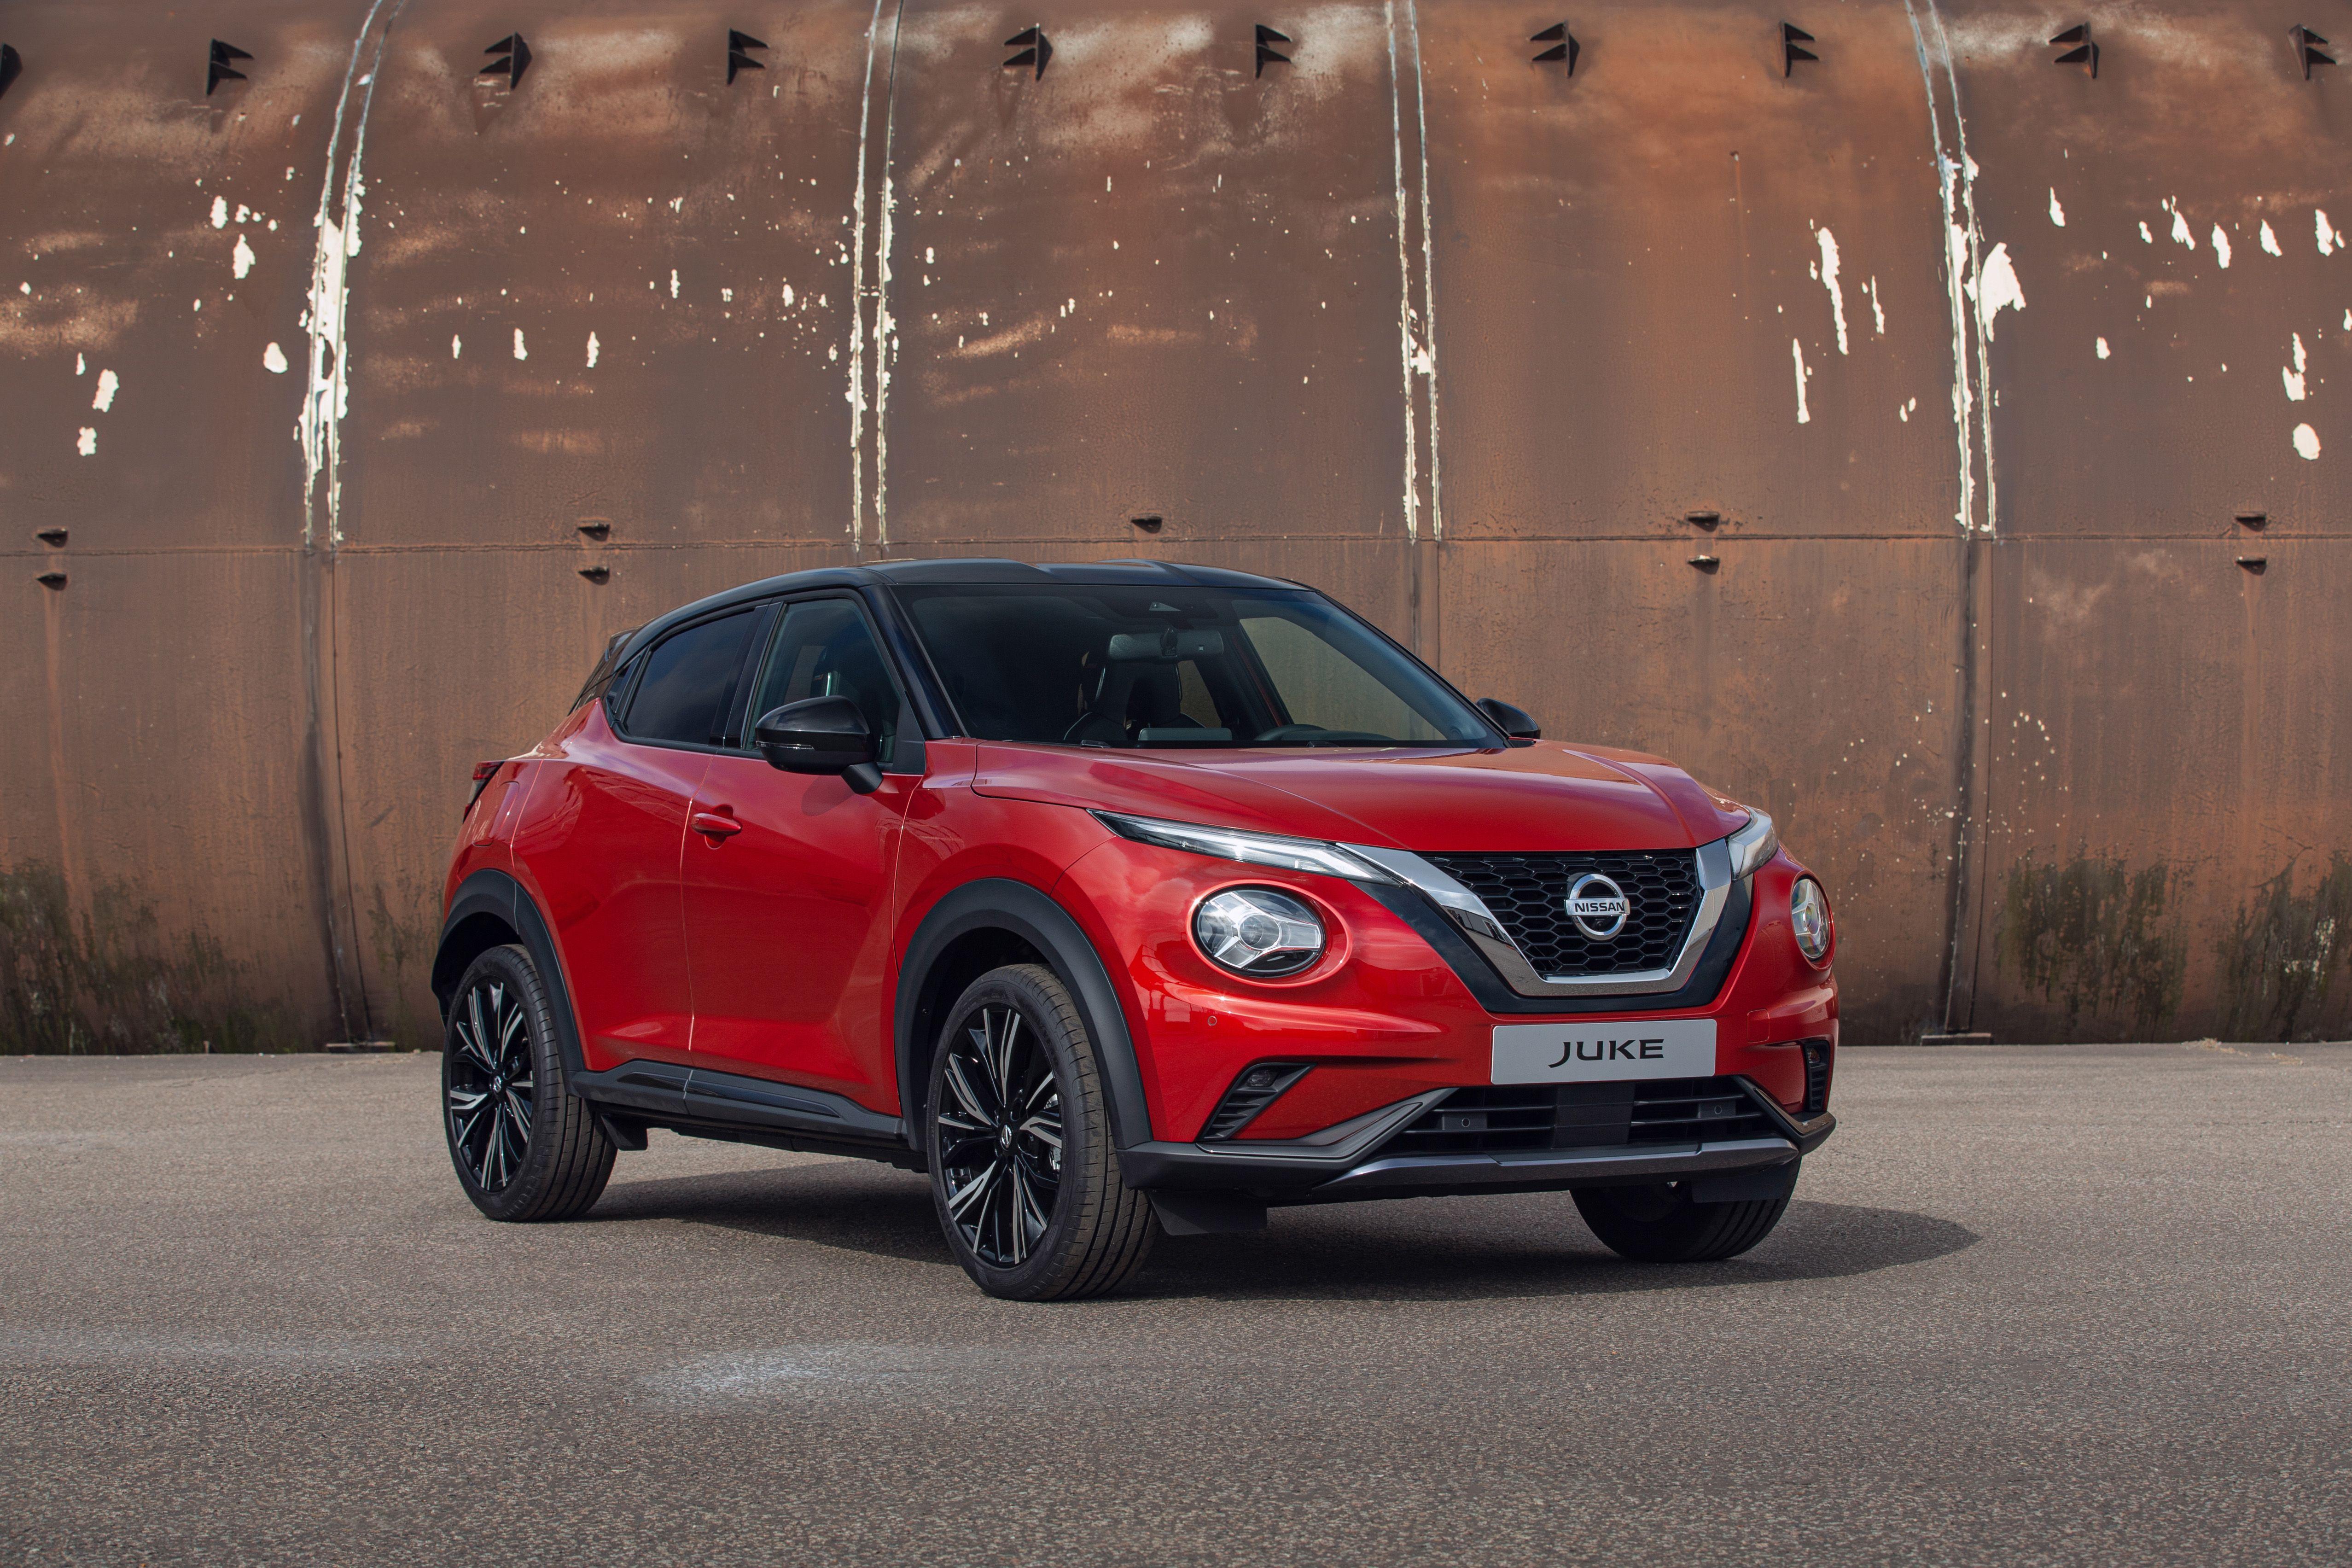 2020 Nissan Juke Specs, New Engine, Changes >> 2020 Nissan Juke Is Every Bit As Weird As Ever